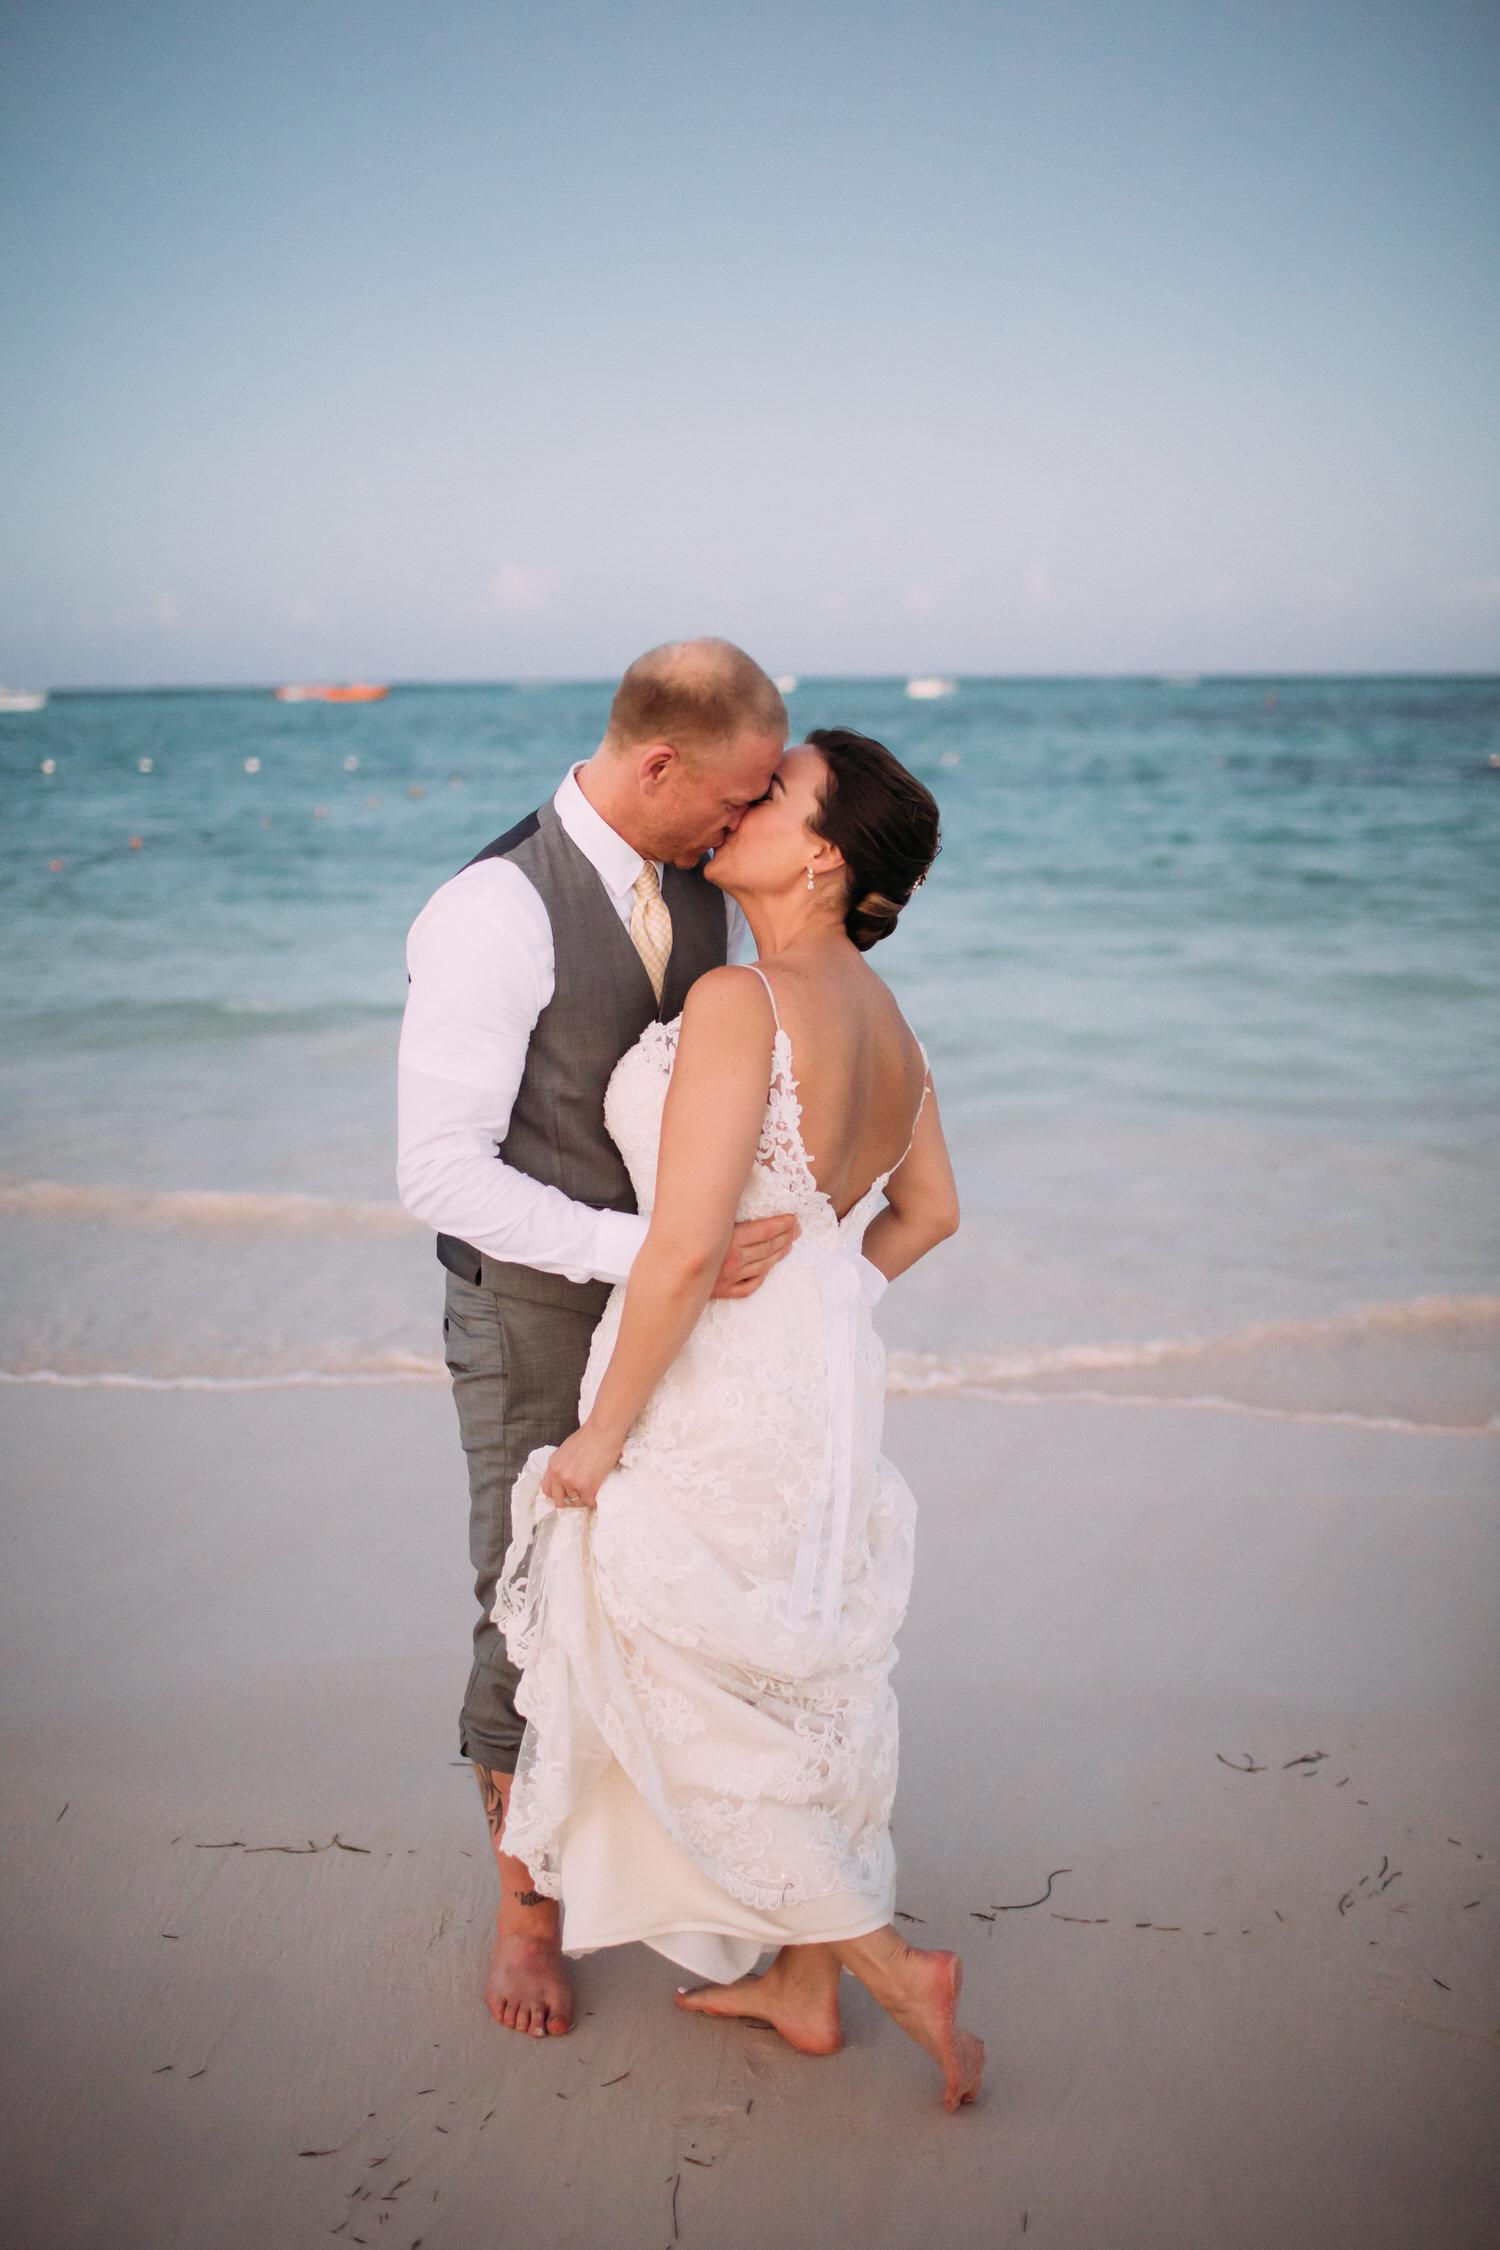 Dominican Republic Destination Wedding, beach, Photographer